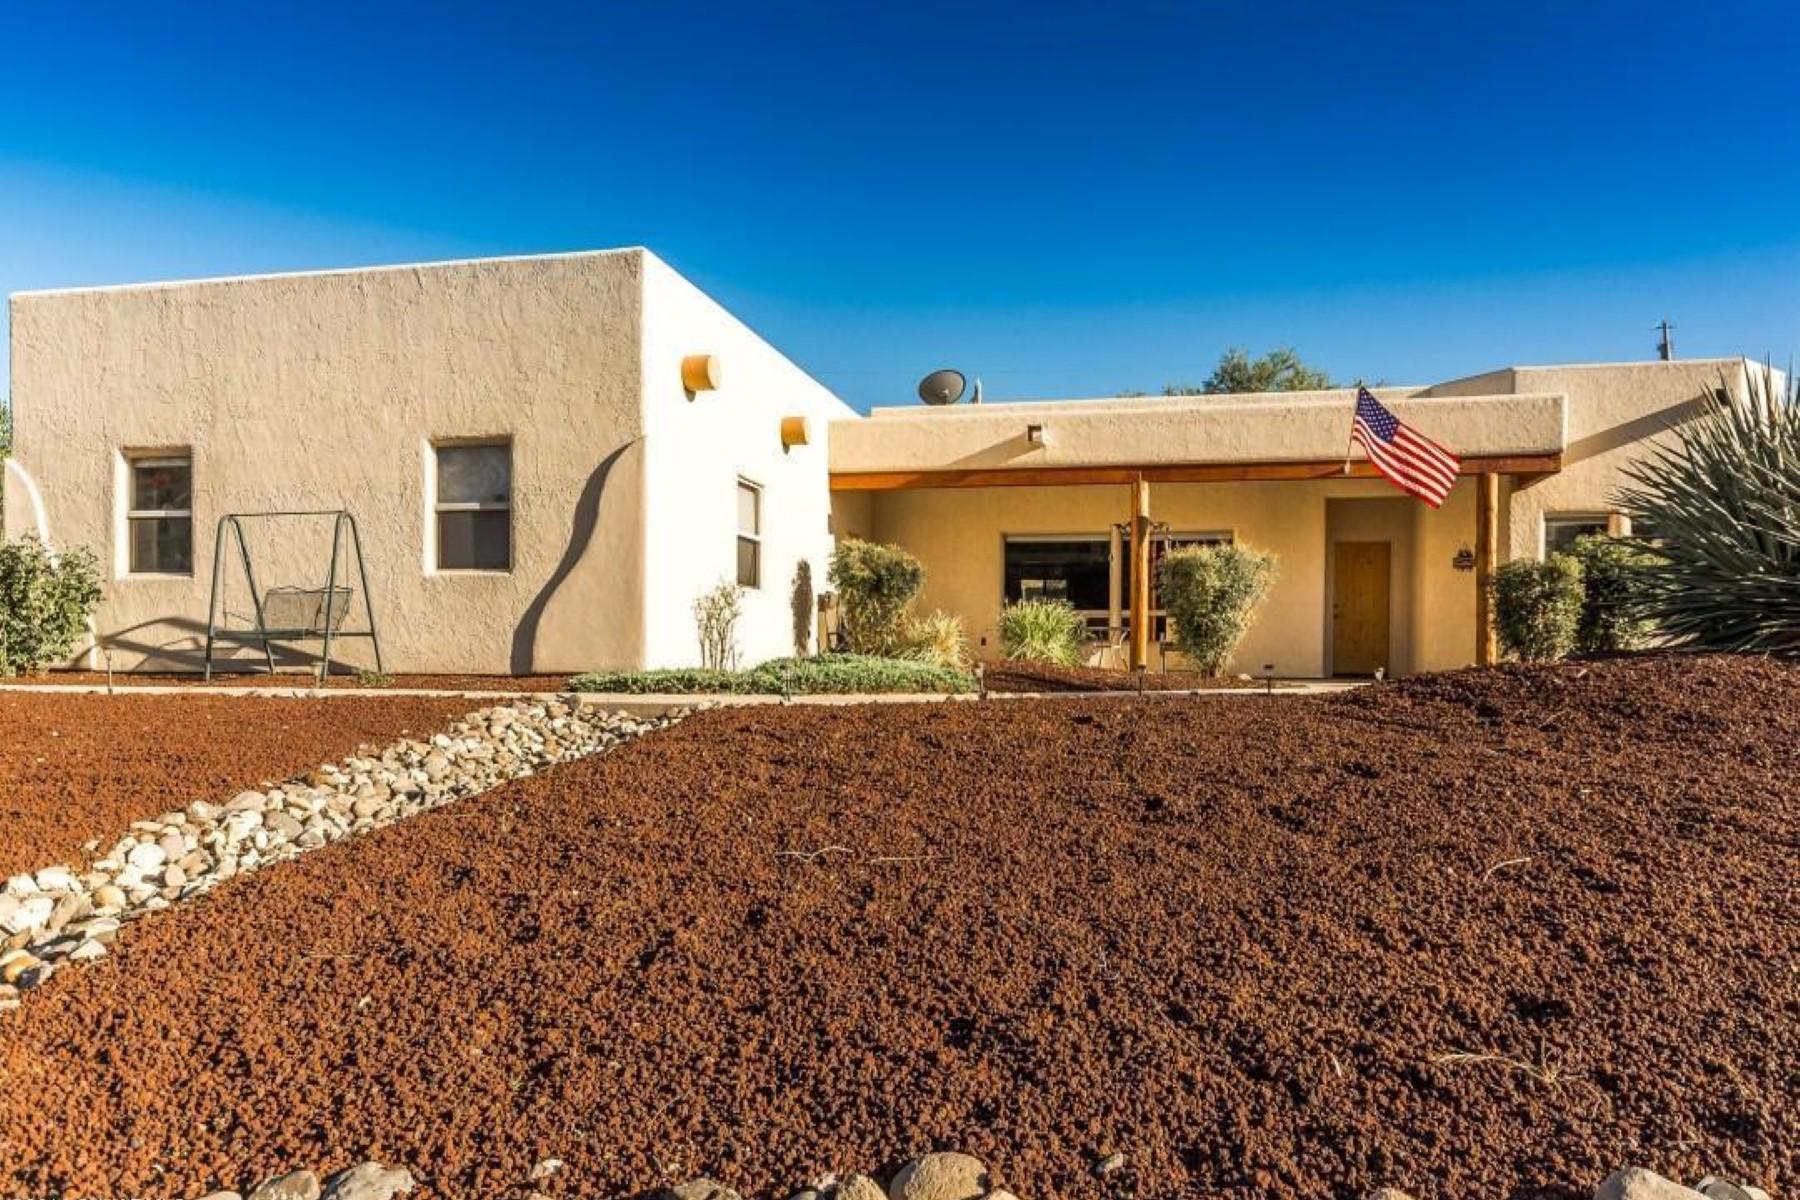 Moradia para Venda às Beautiful Santa Fe Style home 940 N Aspaas Rd Cornville, Arizona, 86325 Estados Unidos